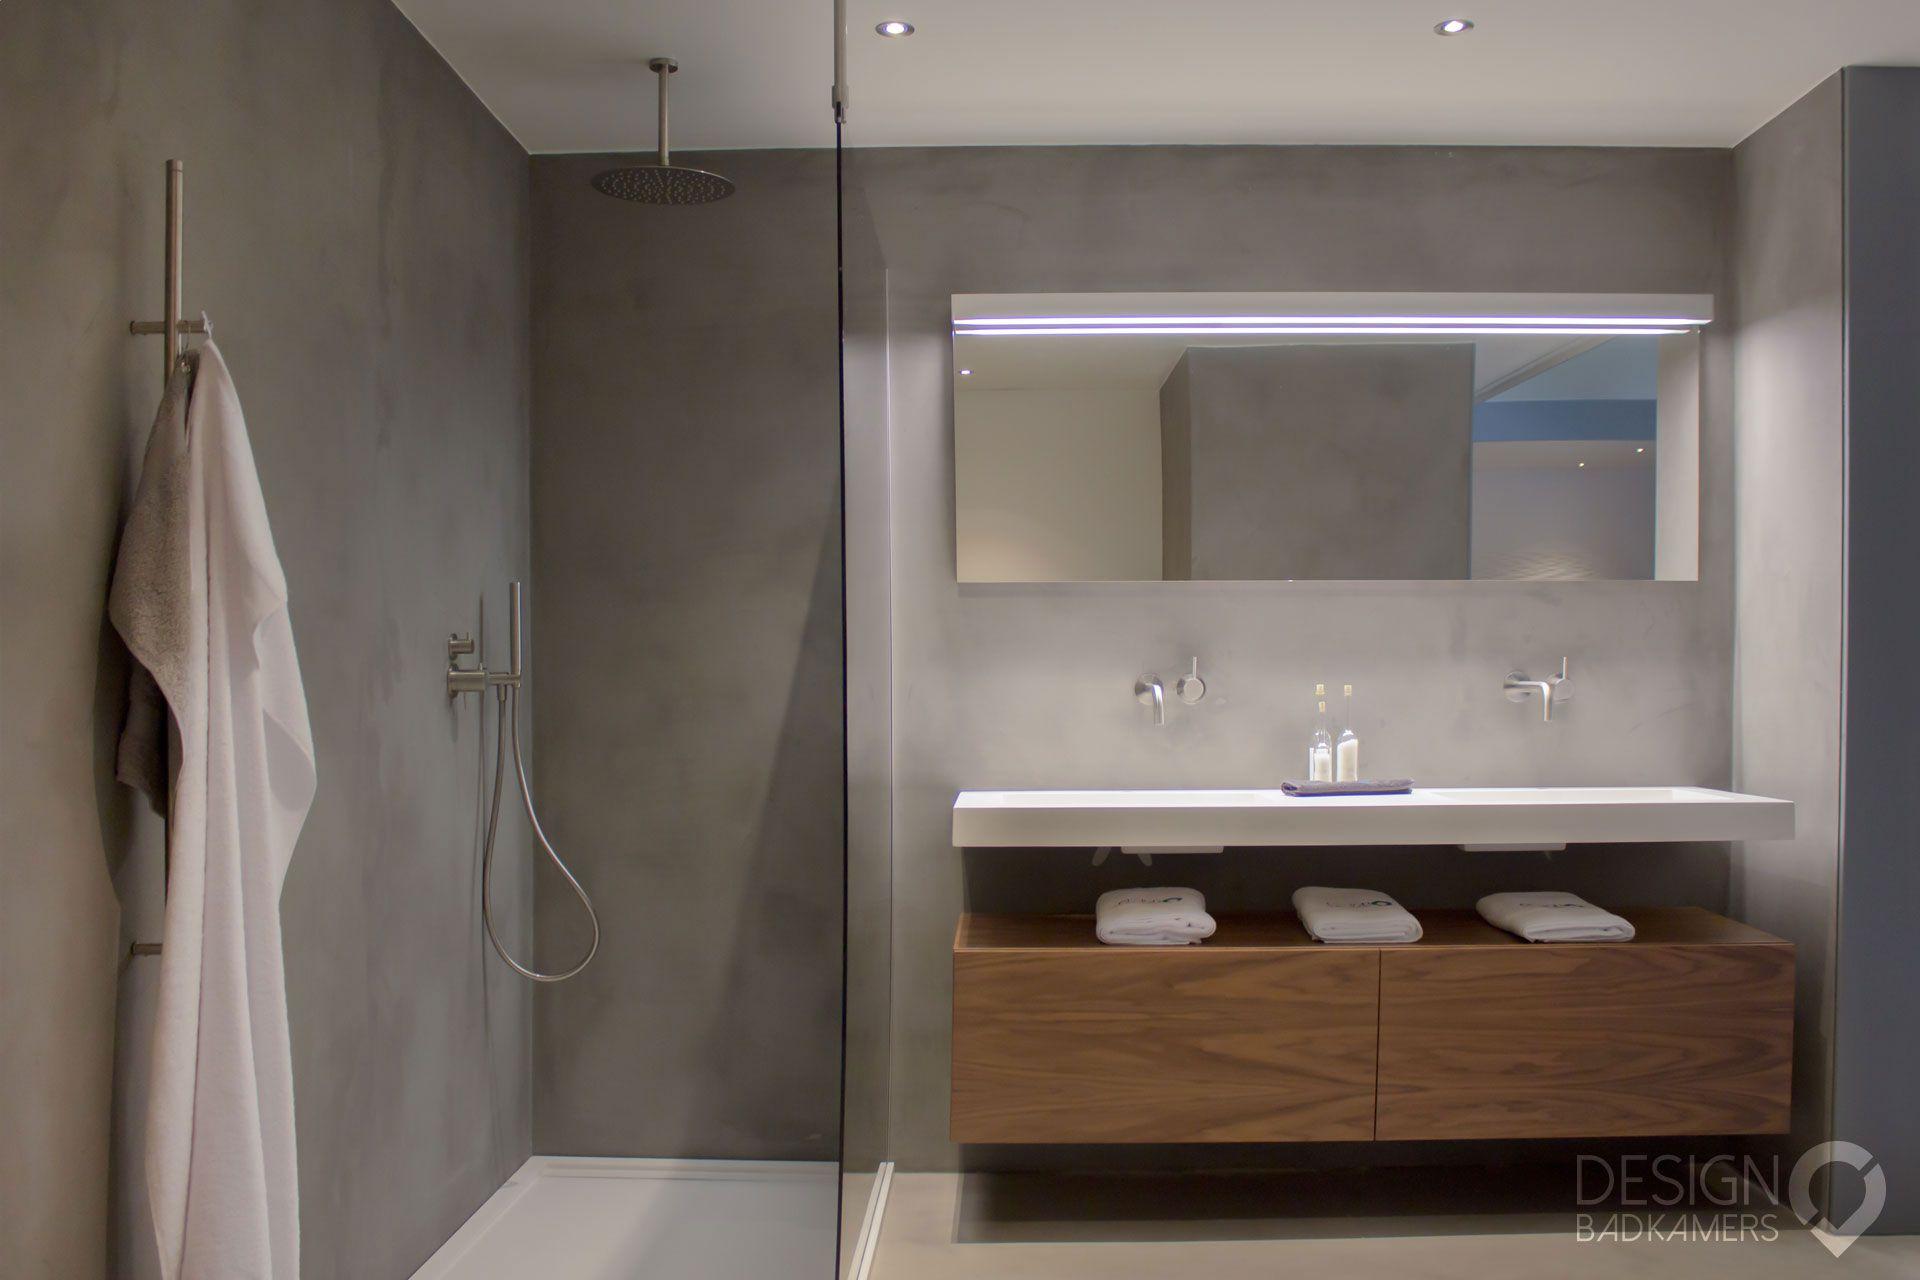 Badkamer Vloer Beton : Maatwerk badkamer met gebruik van micro beton betonciré op de